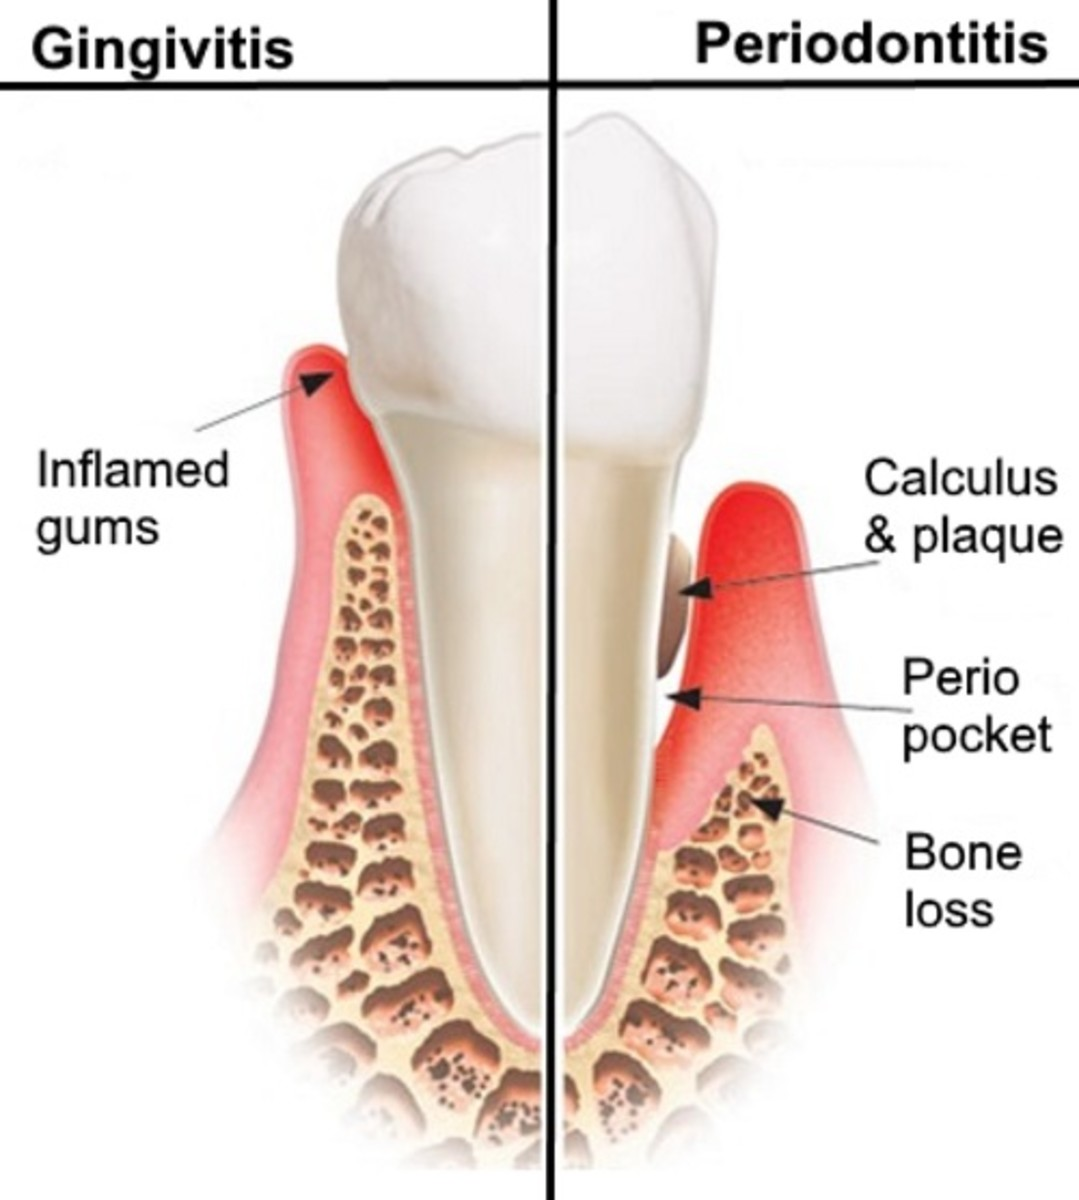 When left untreated, gingivitis often progresses to periodontitis